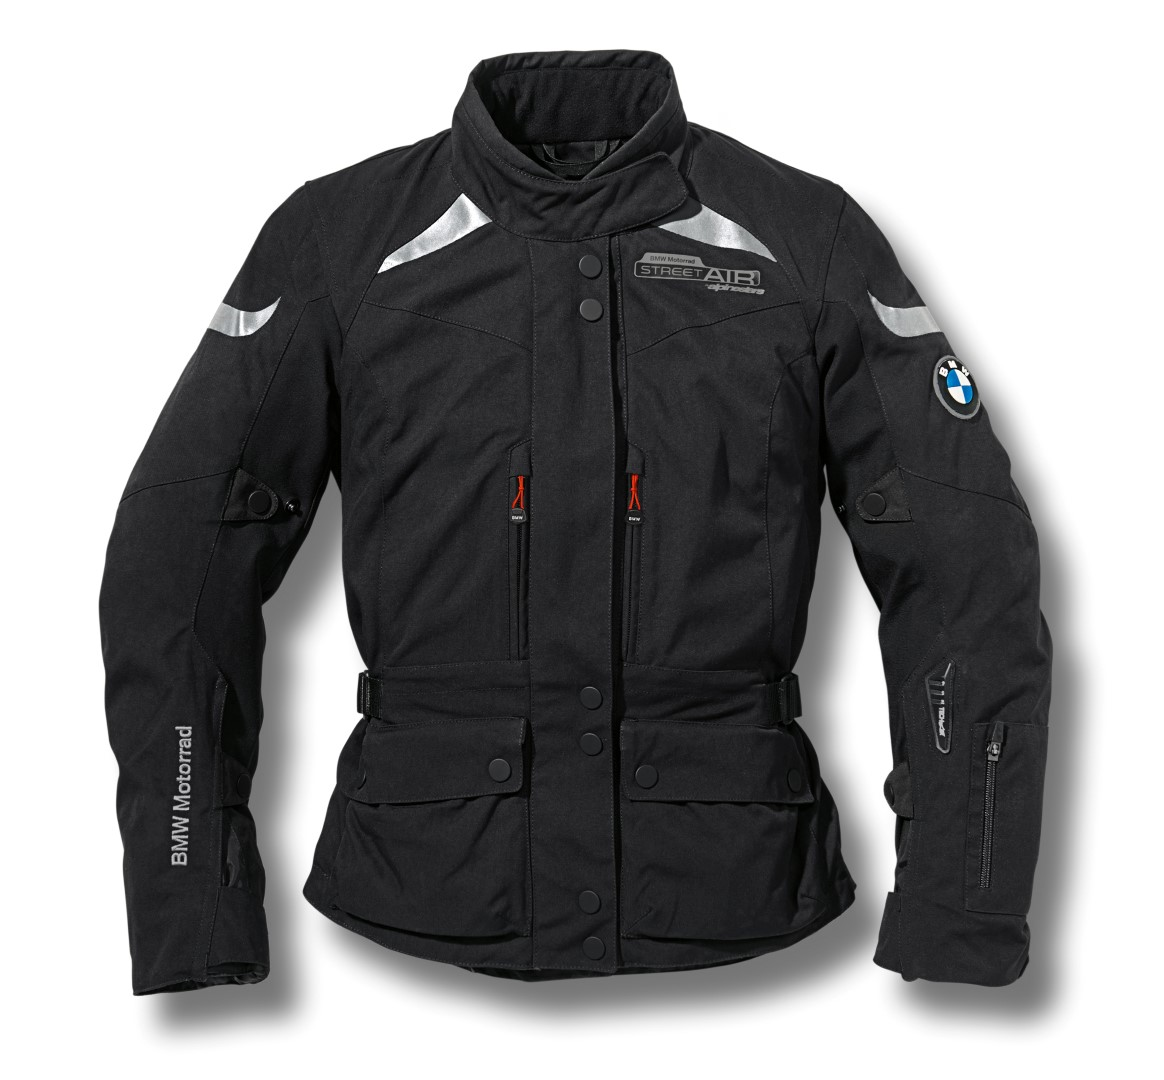 Nueva chaqueta BMW Motorrad Street Air by Alpinestars